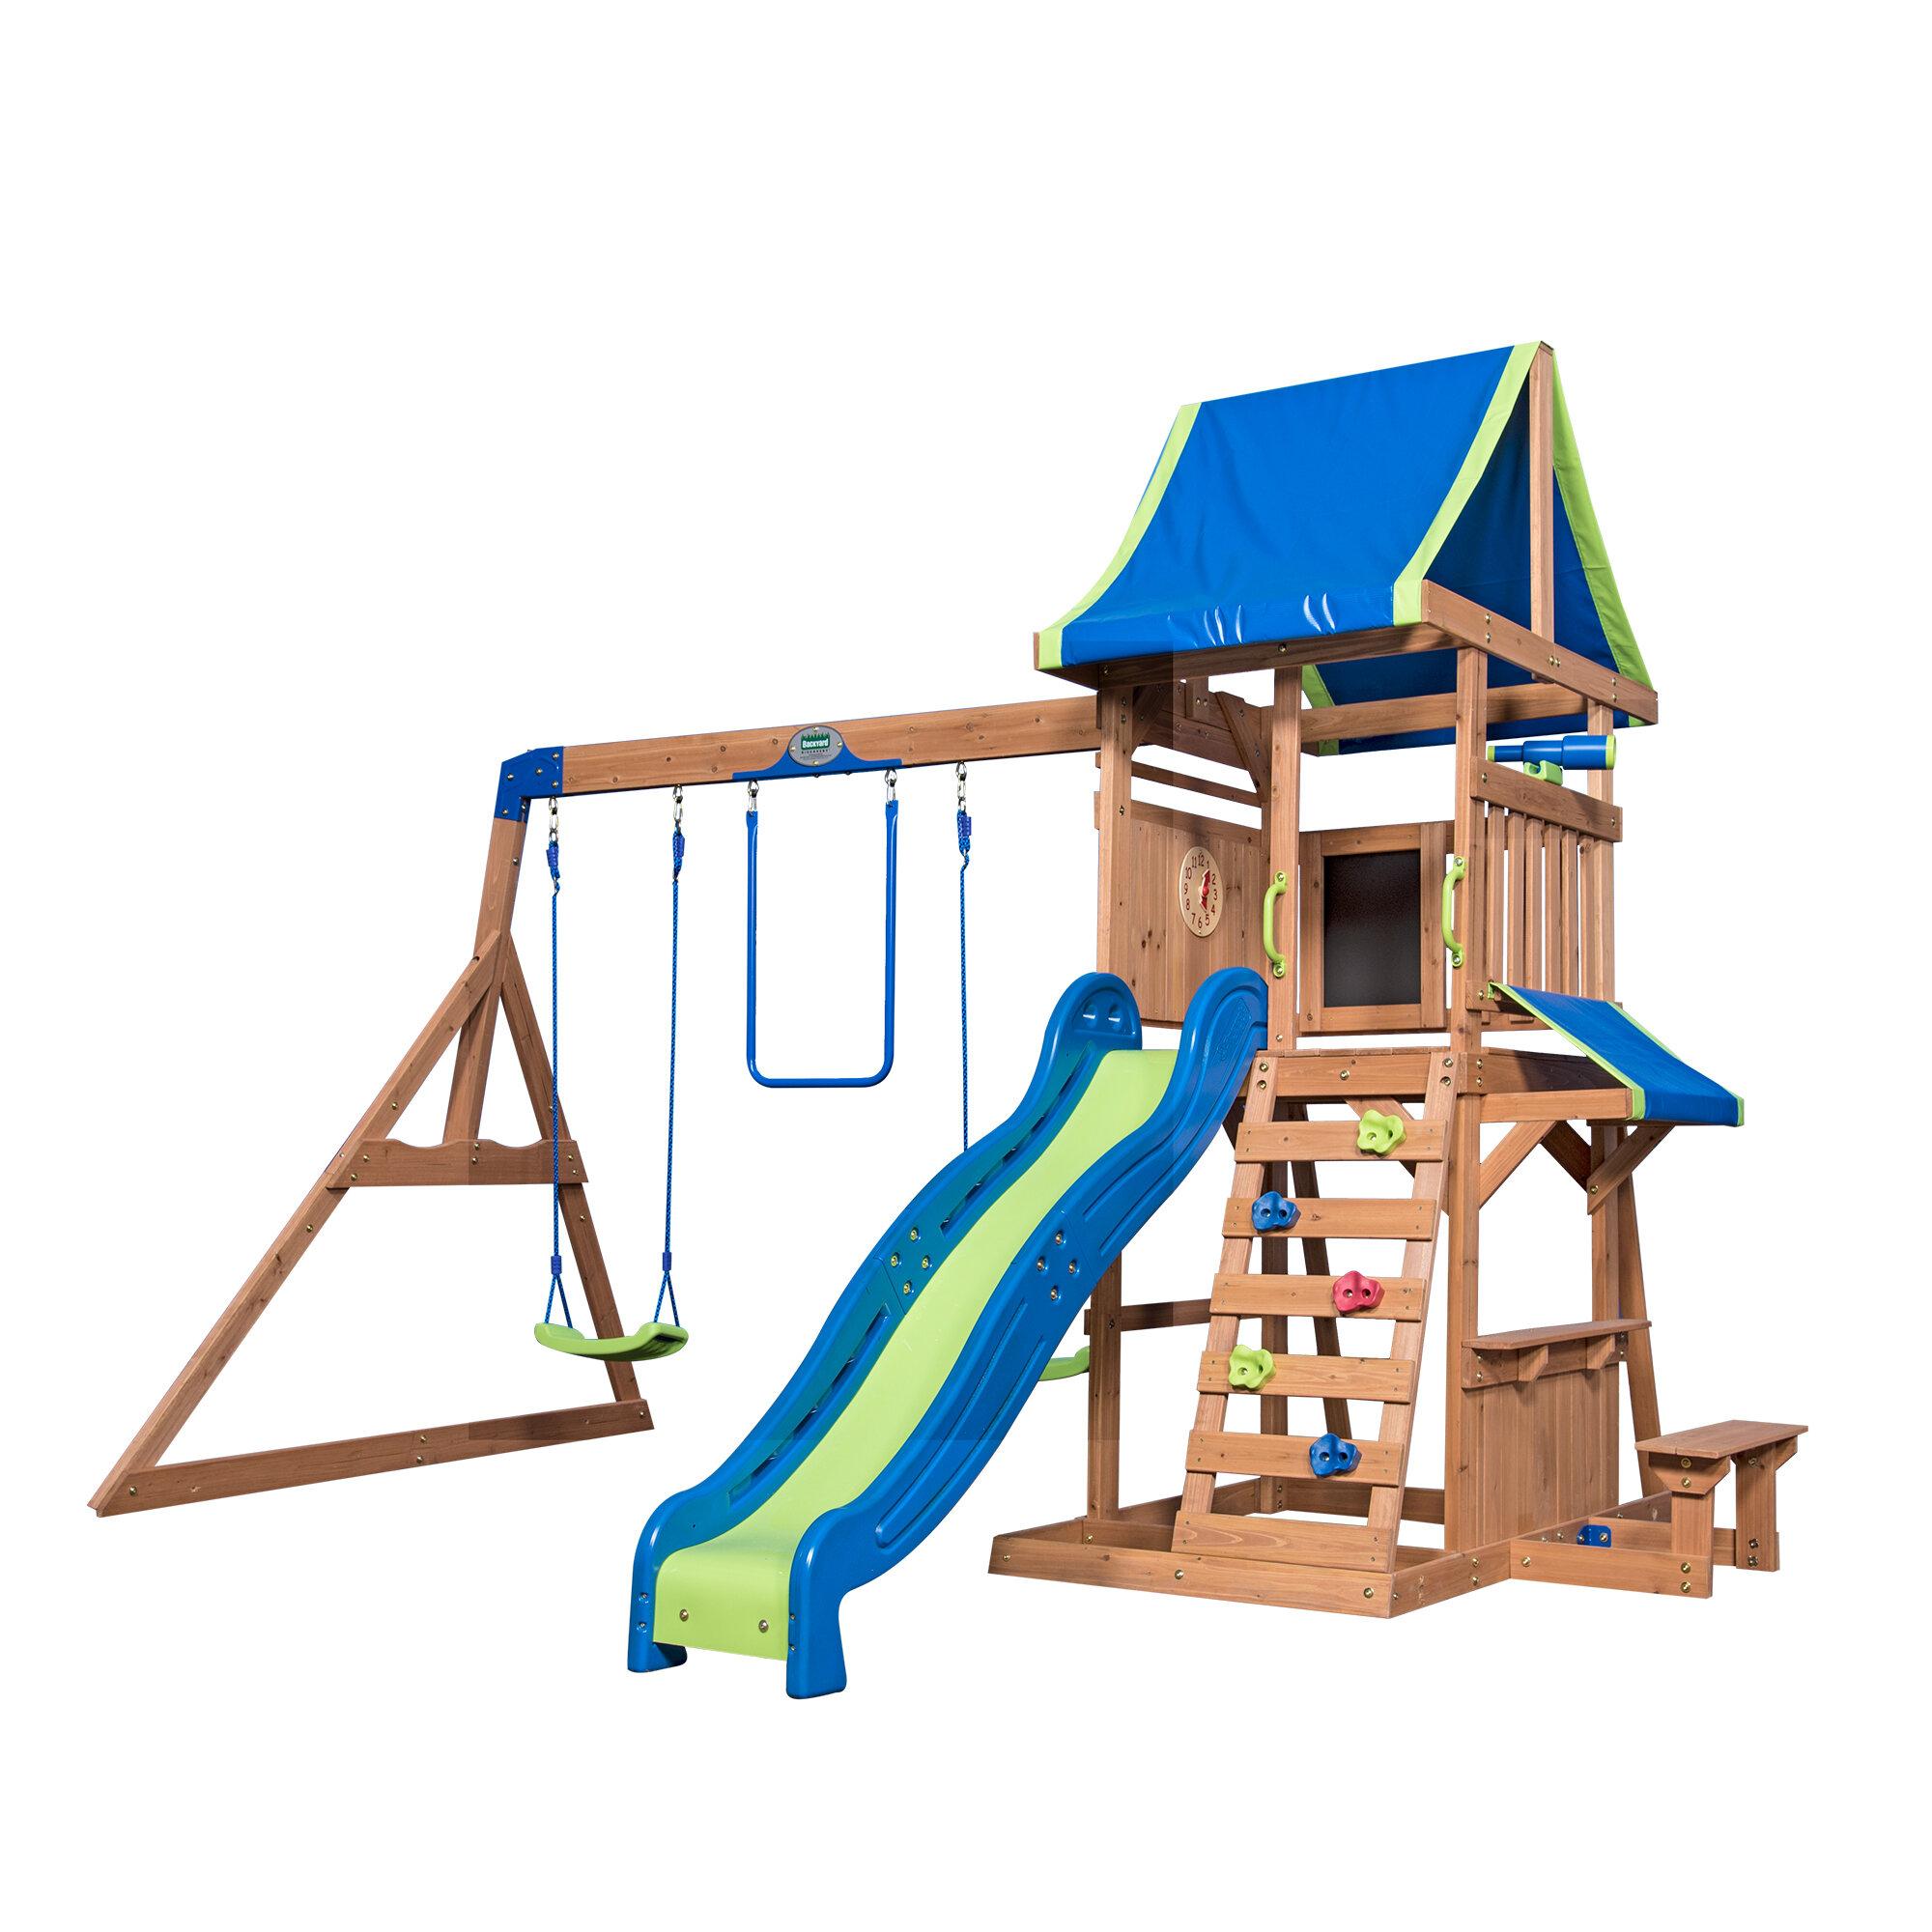 set wholesale discovery club cedar id recipeid somerset ii profileid wood swing product backyard undefined bjs liberty all close imageservice